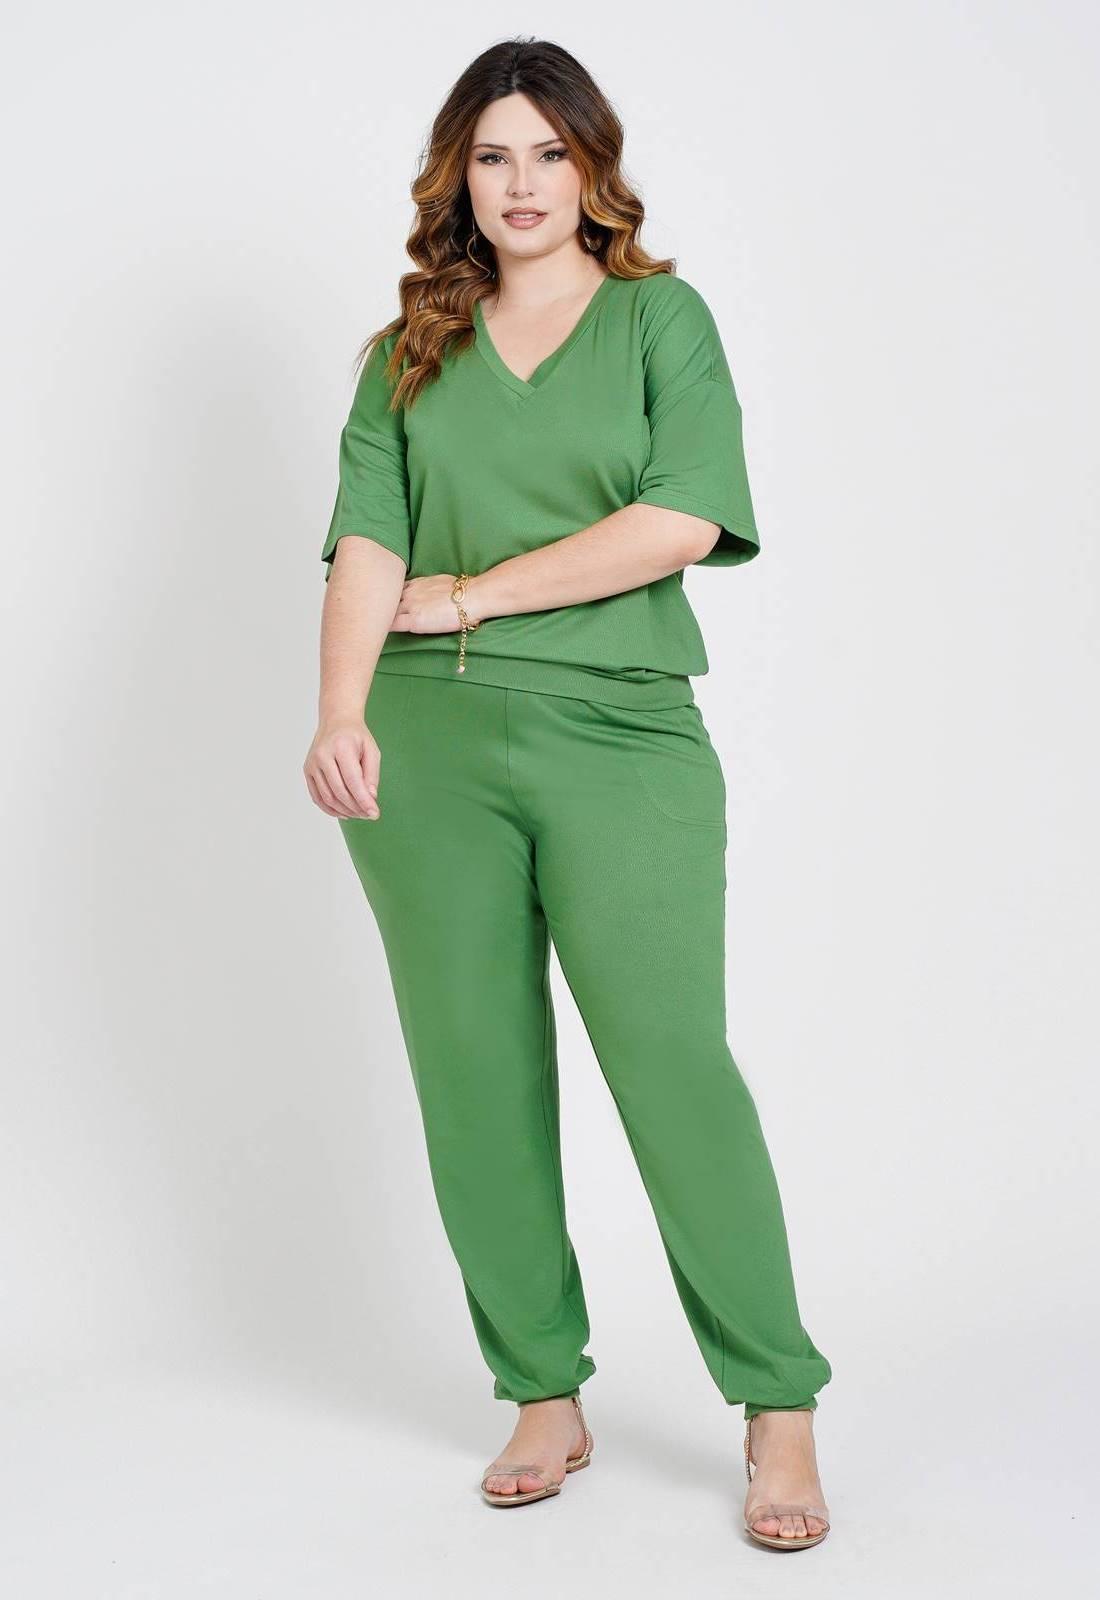 Conjunto malha blusa e calça verde Ref. U80621